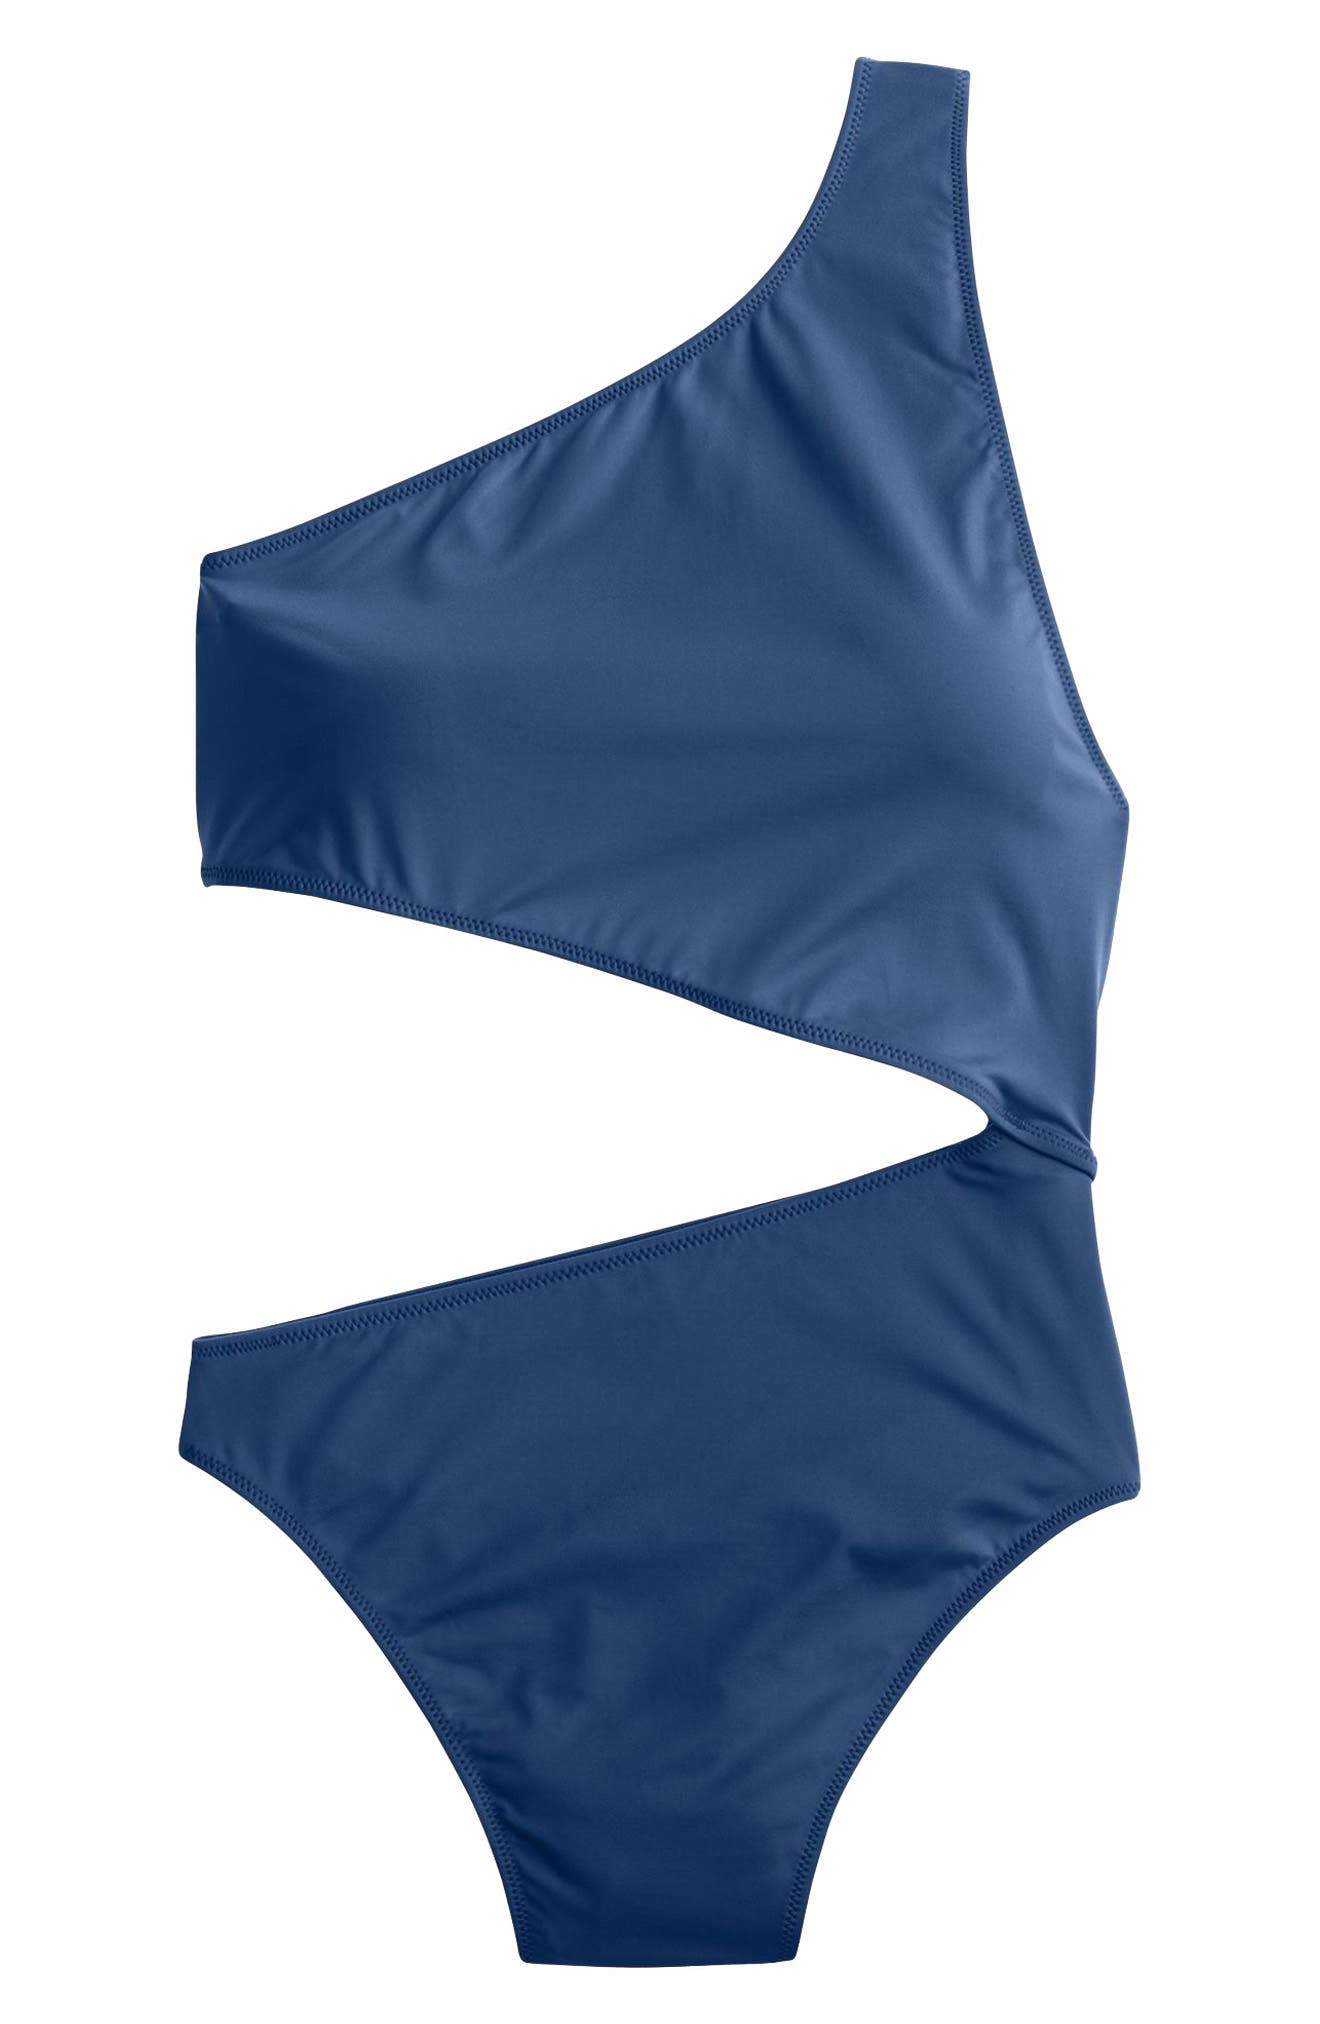 Playa Tilden One-Shoulder One-Piece Swimsuit,                             Alternate thumbnail 6, color,                             400